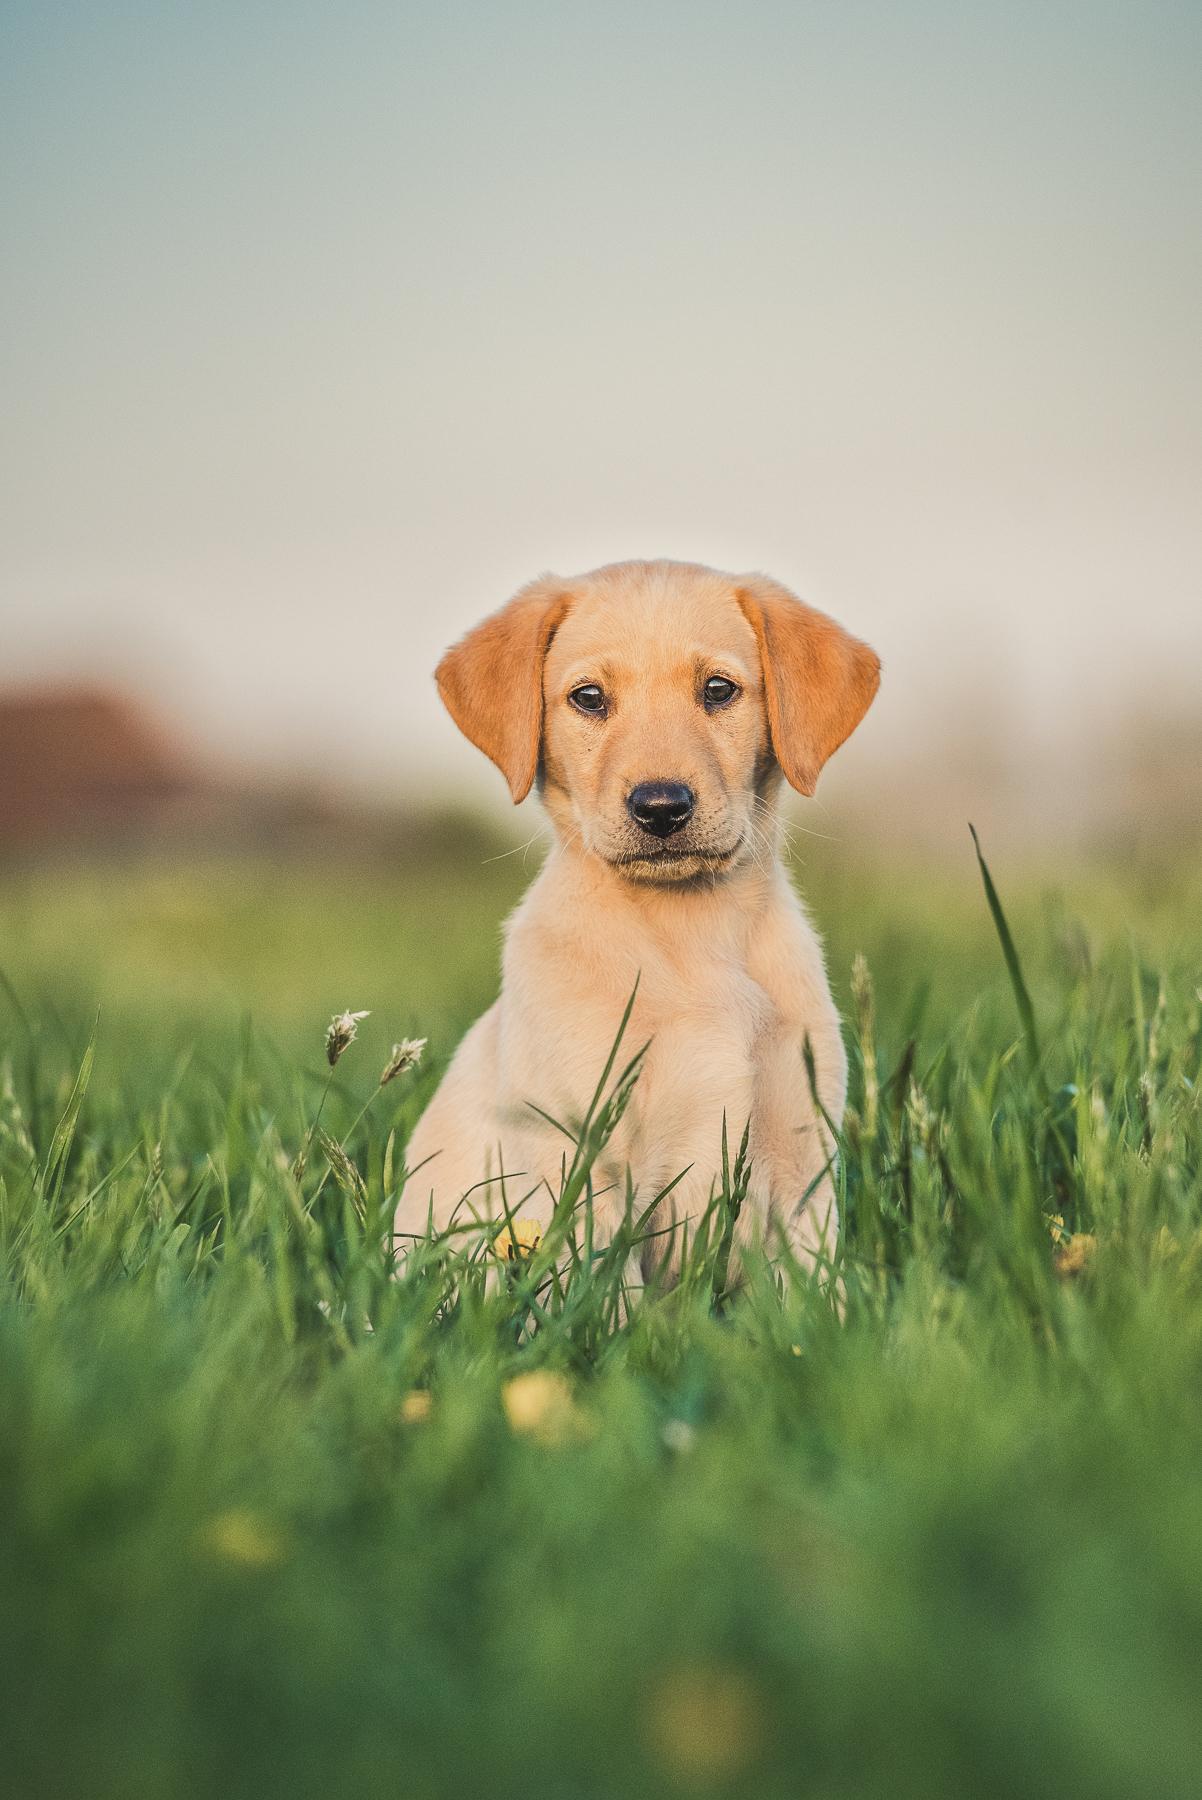 Labrador puppy sitting in the grass